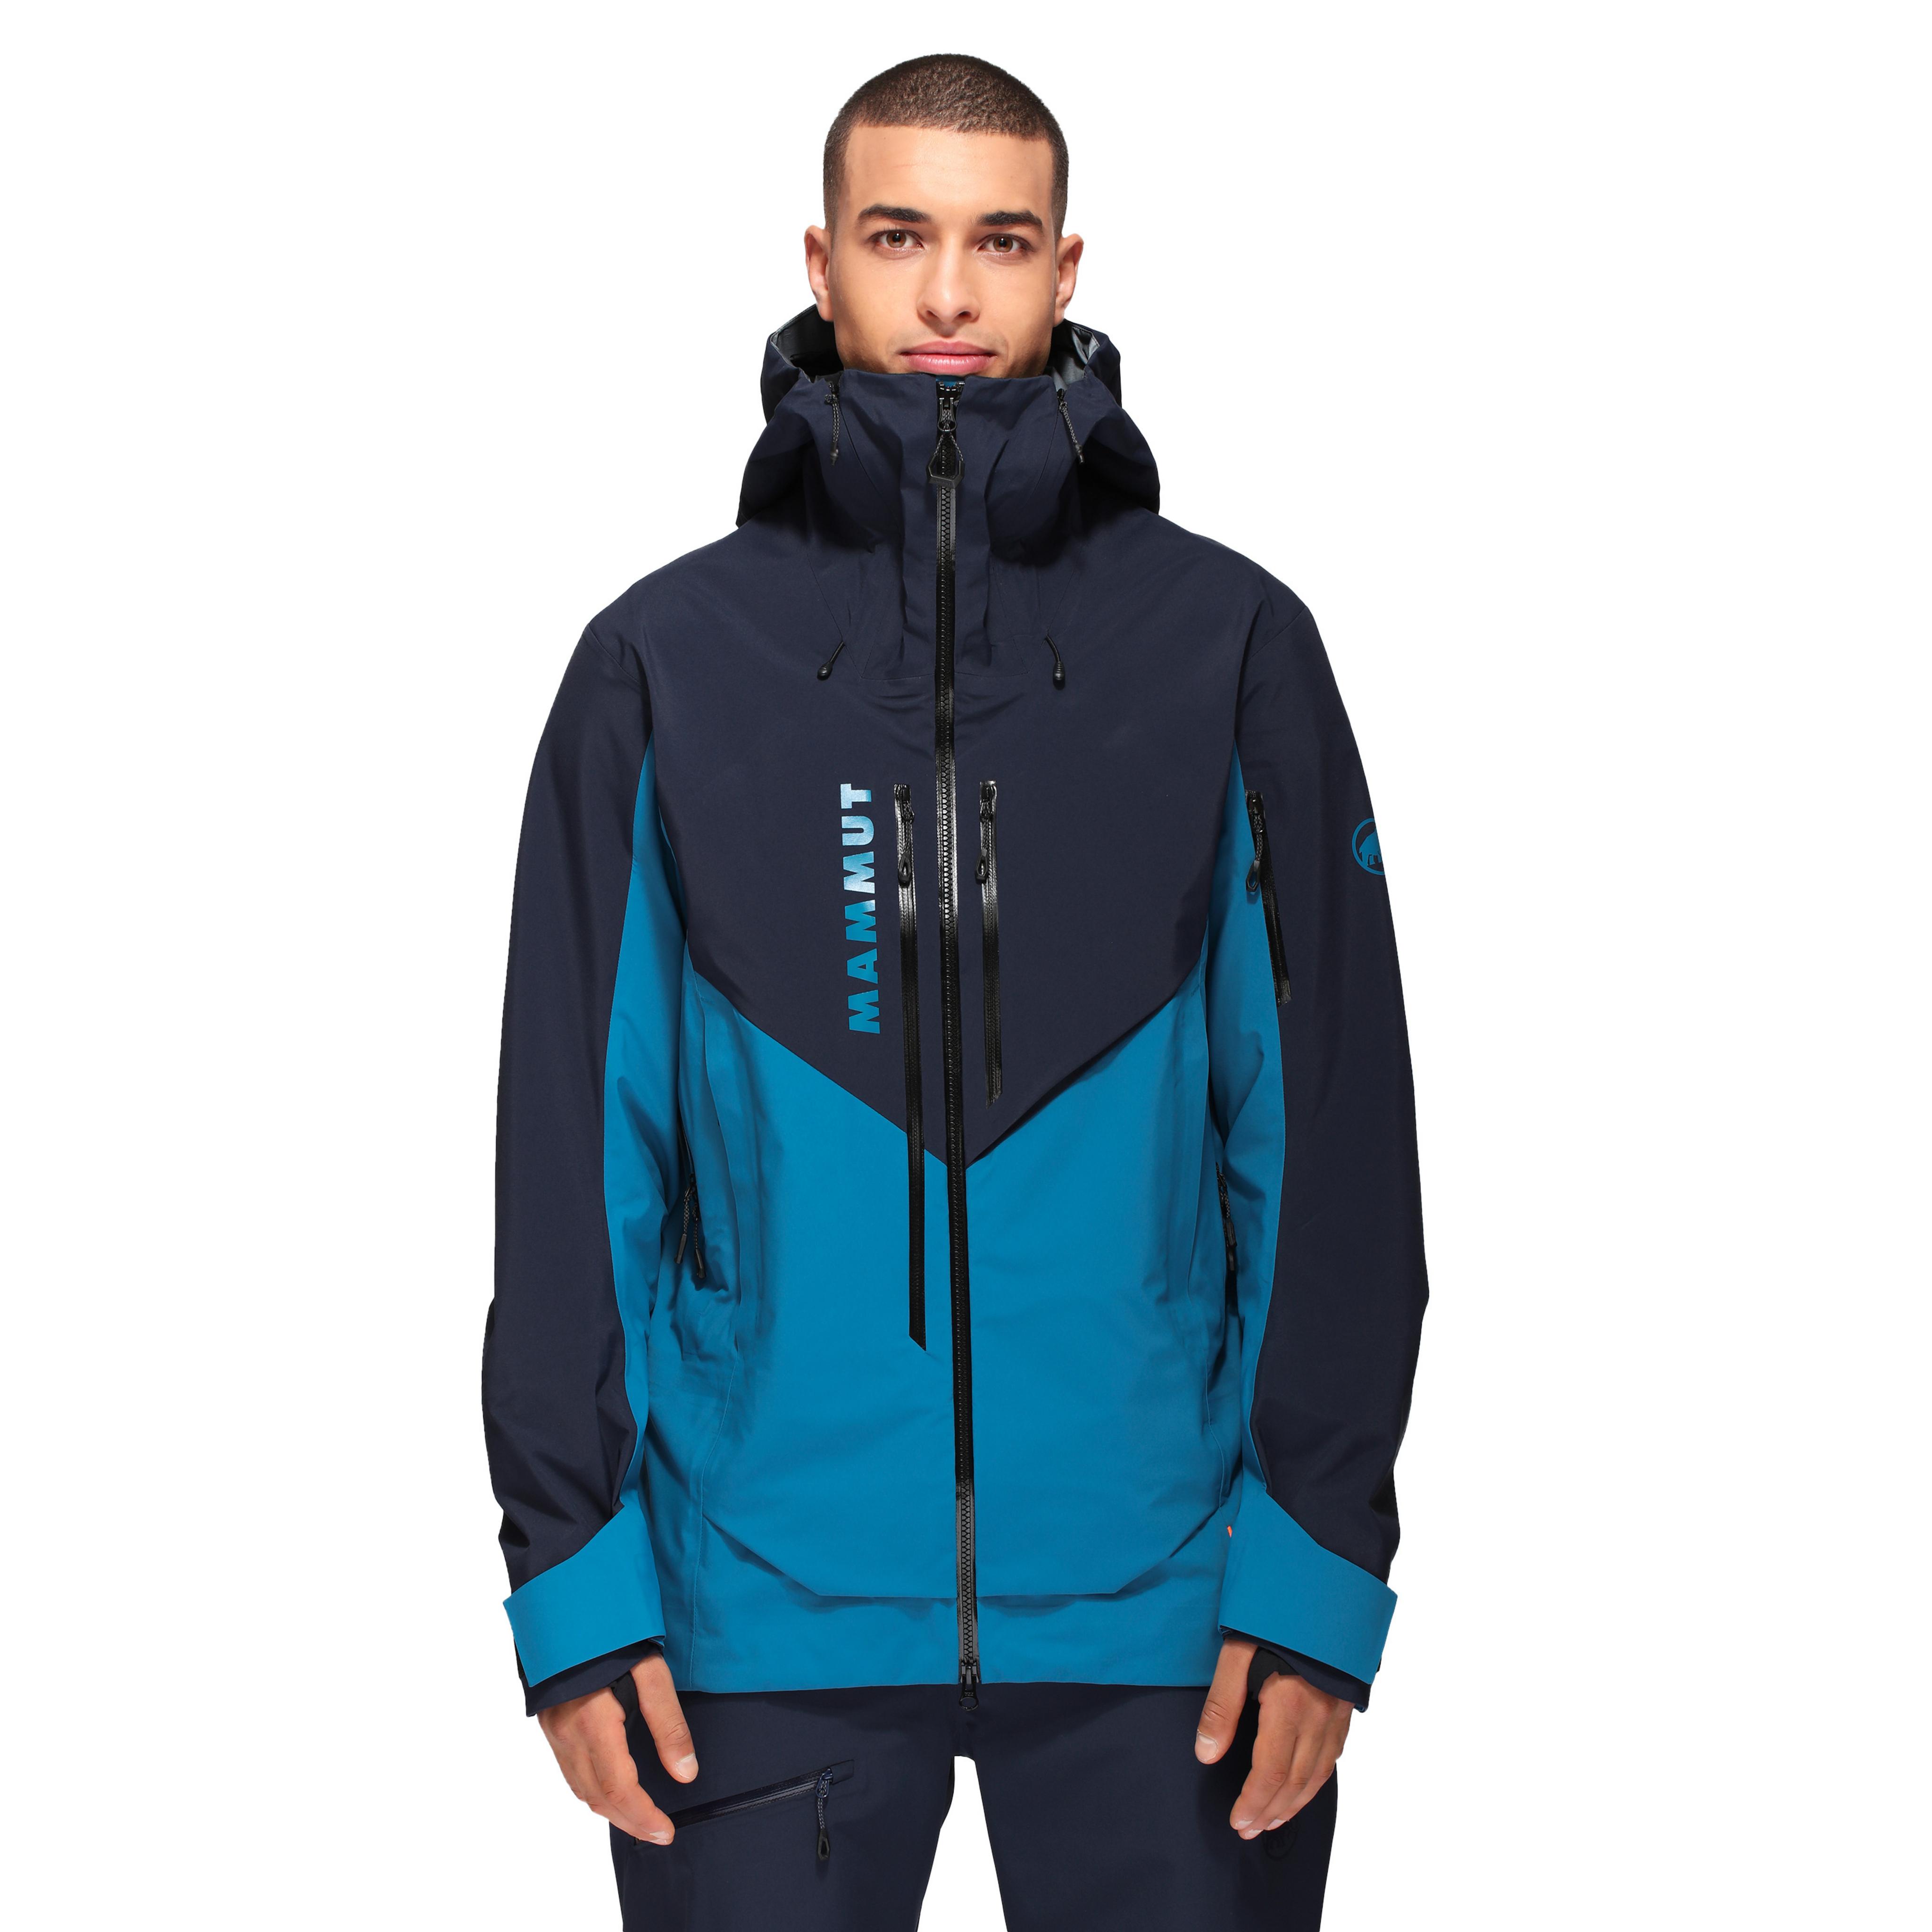 La Liste Pro HS Hooded Jacket Men product image